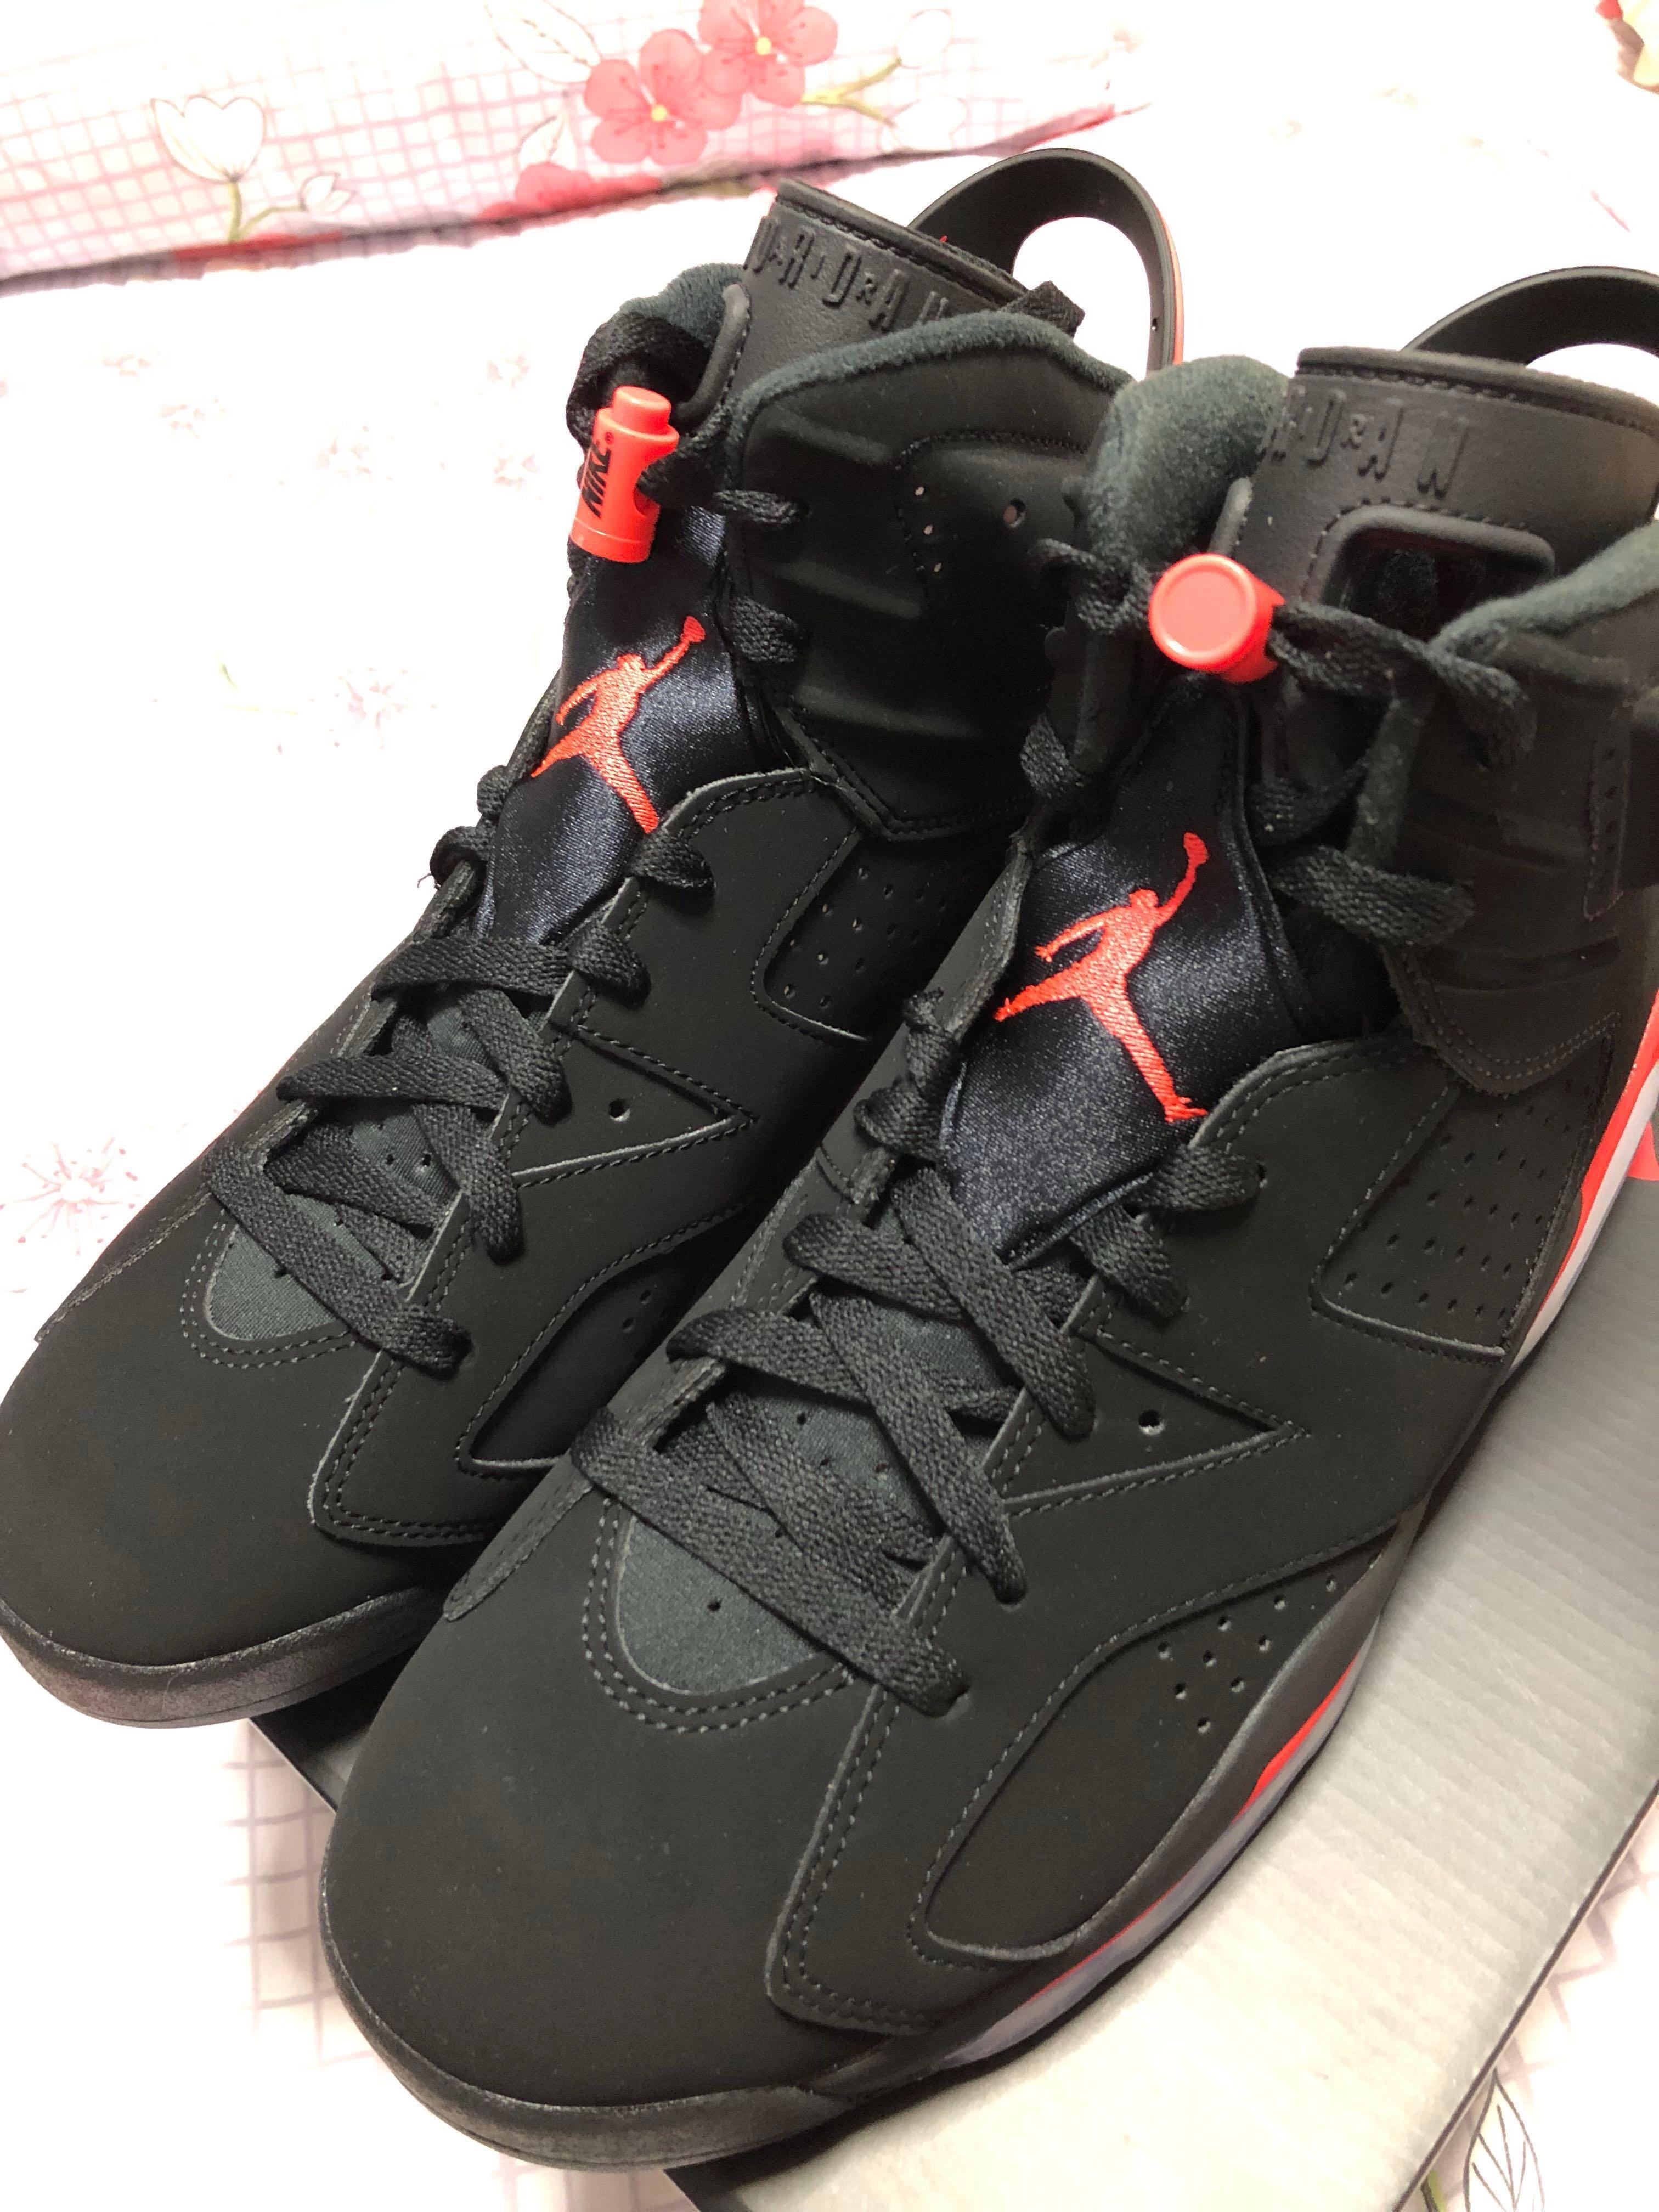 huge selection of 5e0b8 4a449 Air Jordan 6 Retro Black Infrared (2019) US 9.5, Men s Fashion ...